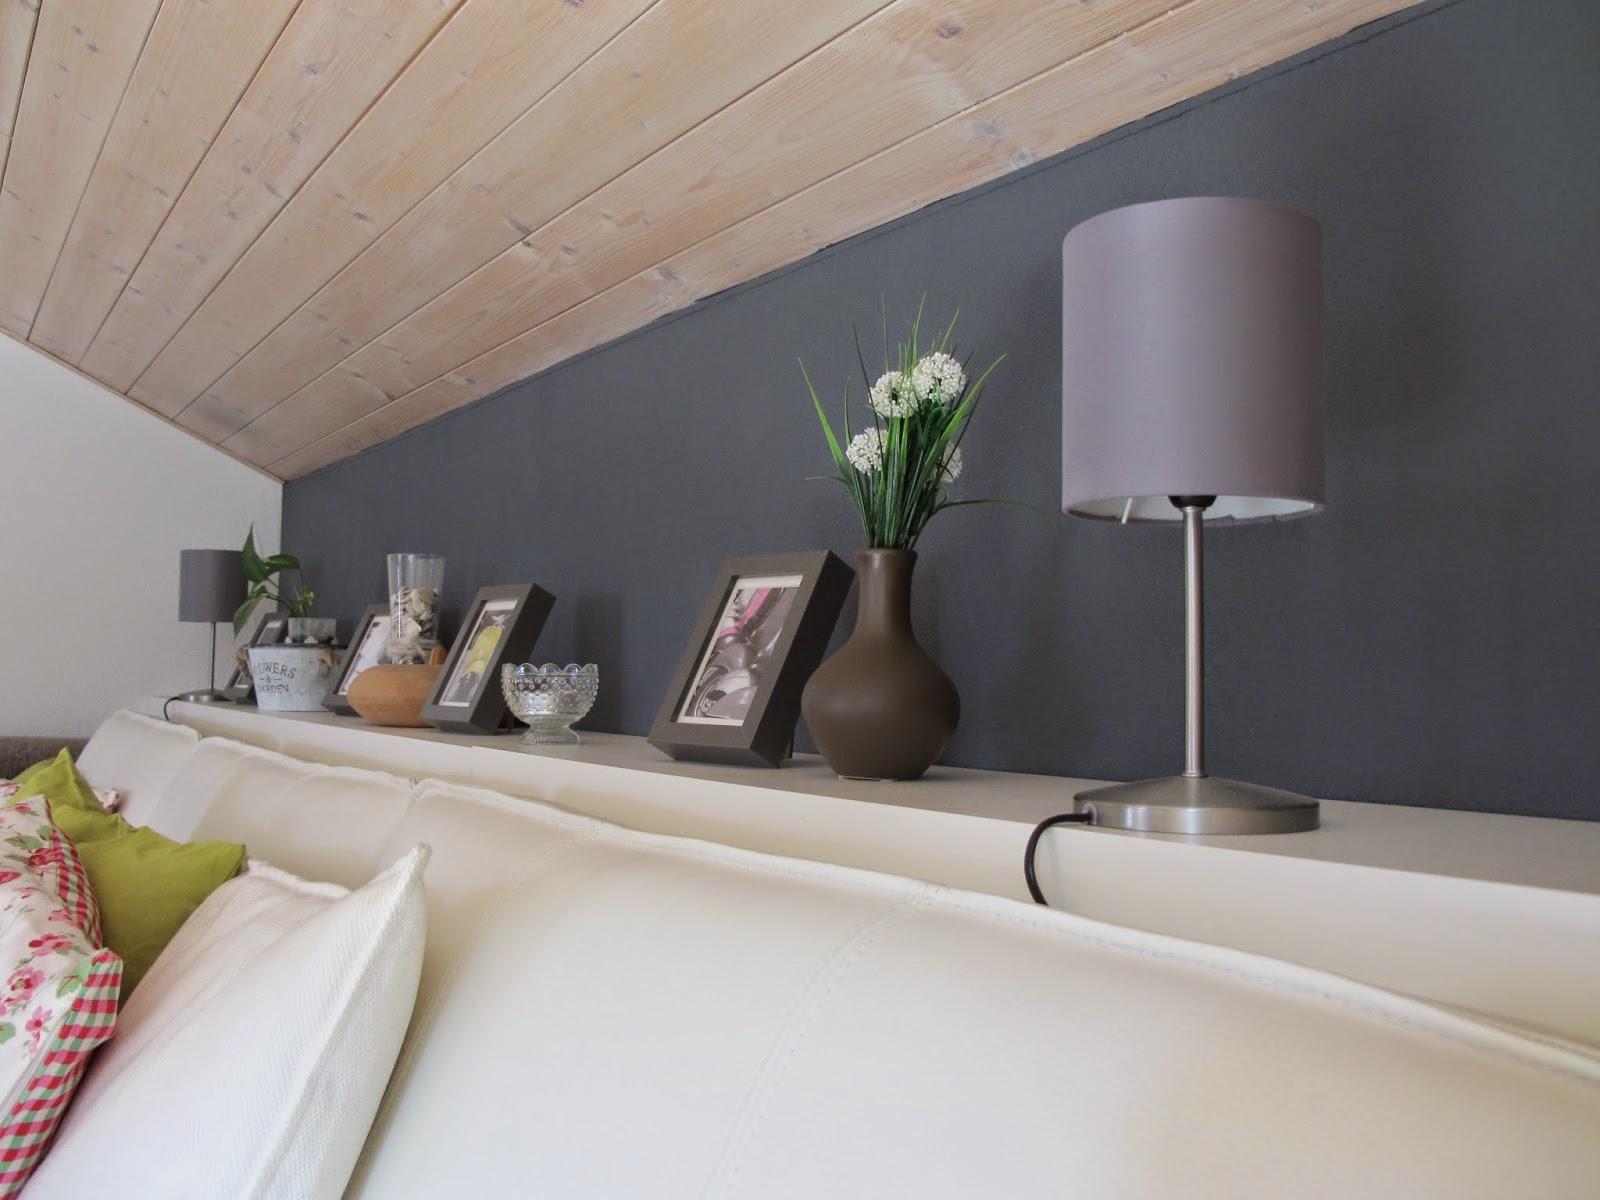 regal hinter beautiful hemnes kommode geniale ideen regal hinter hemnes kommode geniale ideen. Black Bedroom Furniture Sets. Home Design Ideas